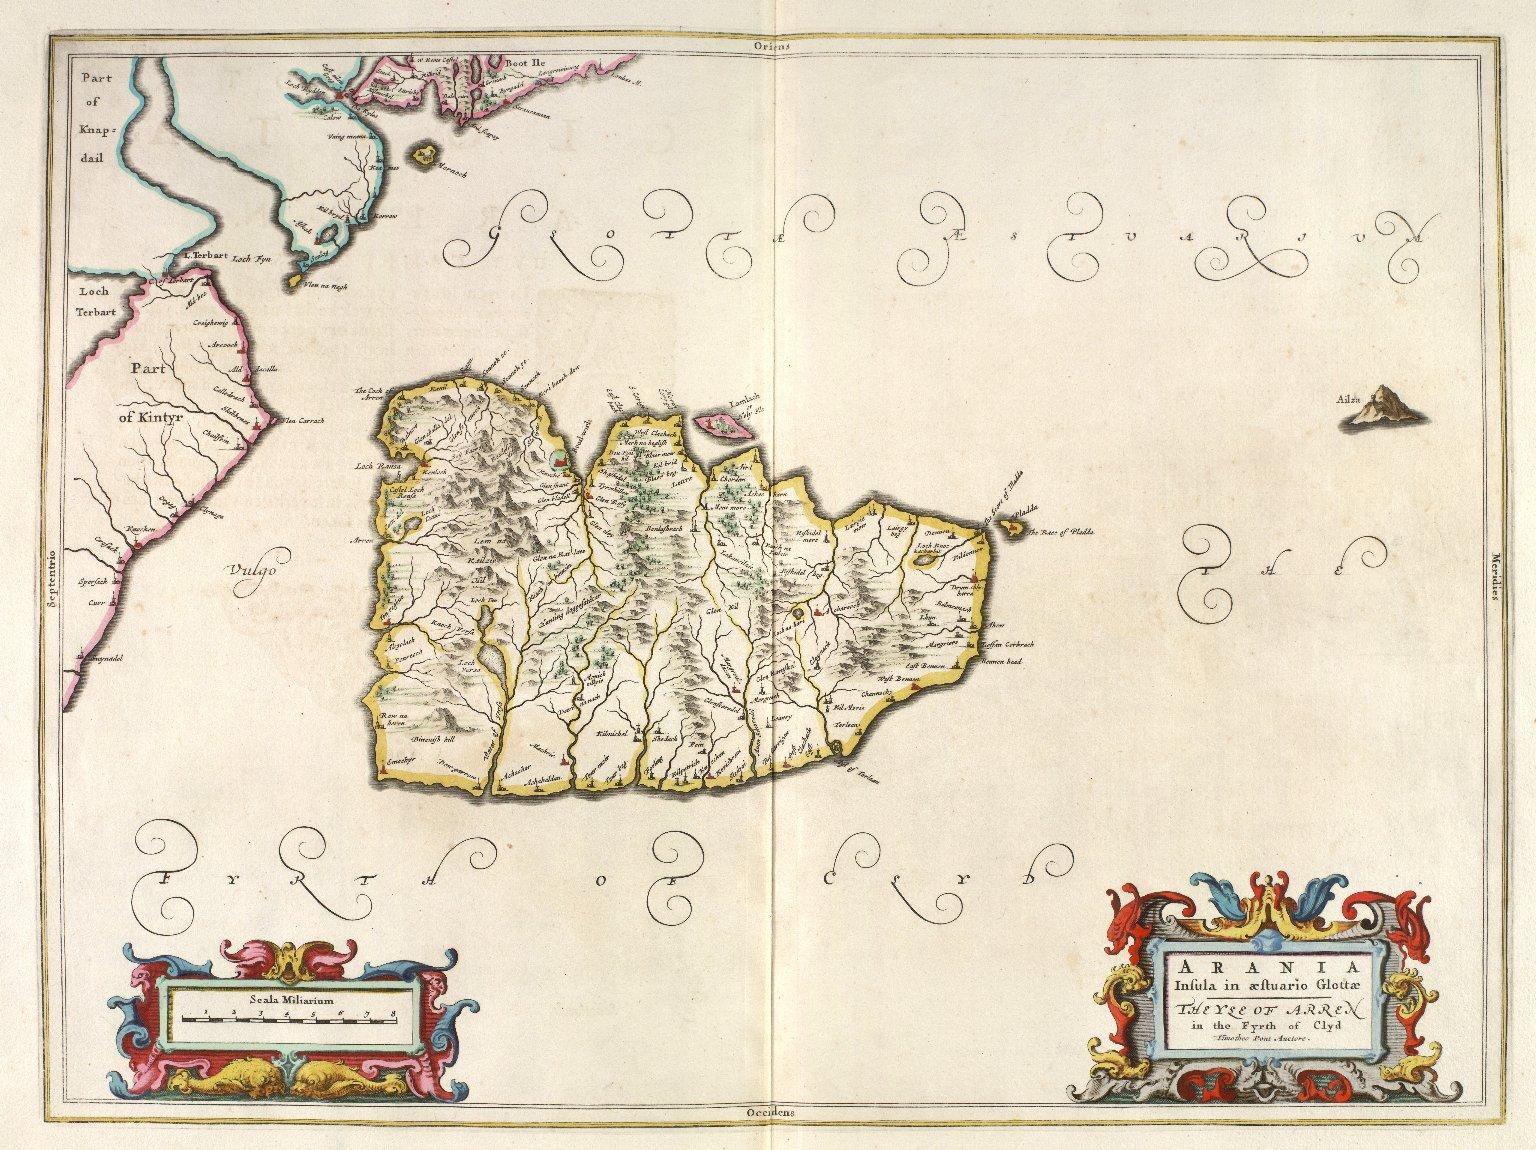 Arania Insula in aestuario Glottae The Yle of Arren in the Fyrth of Clyd [1 of 1]